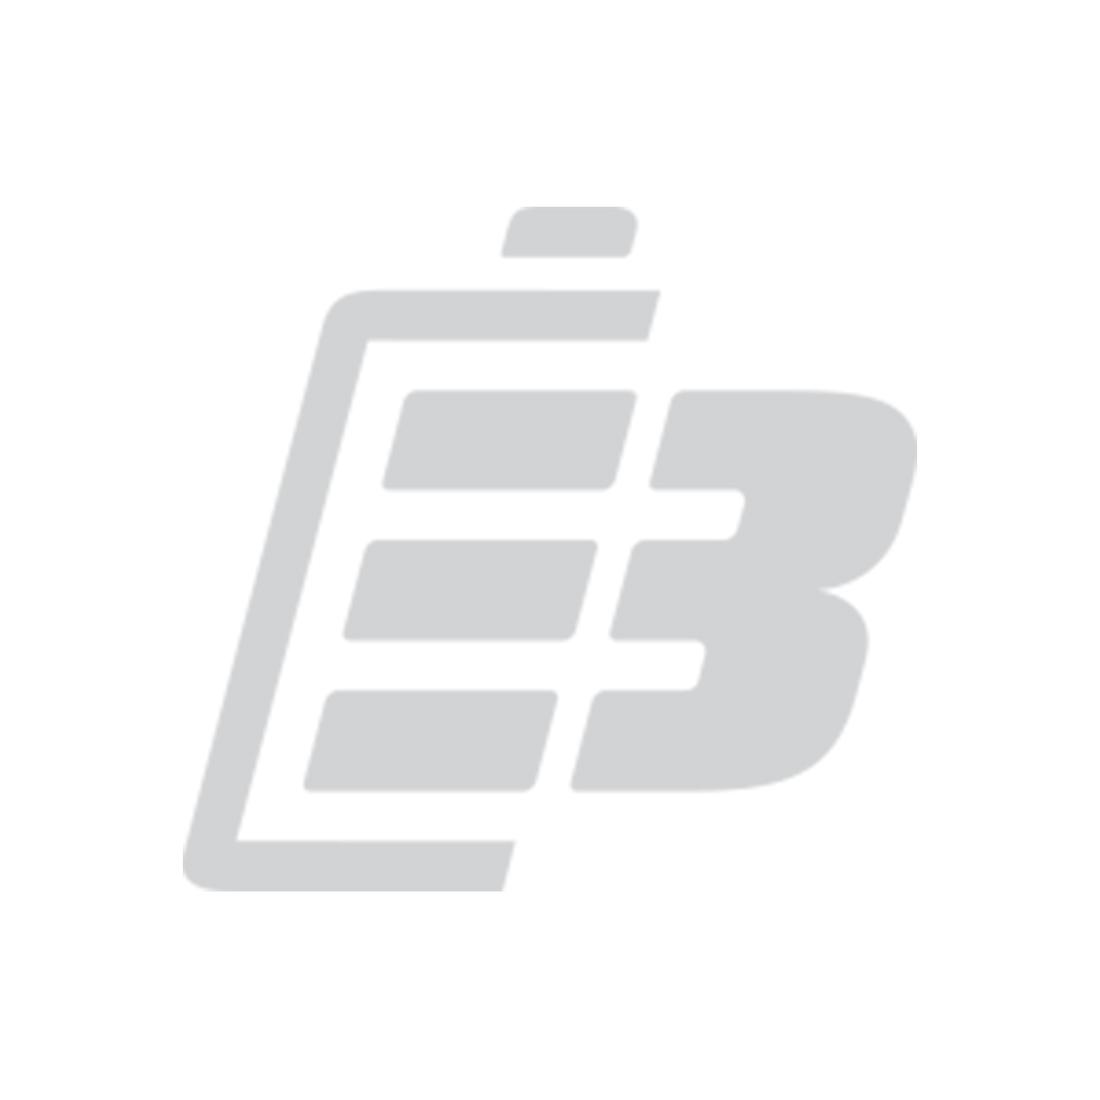 Choetech PD72-1C3U 72W 4 Ports USB Charger 1